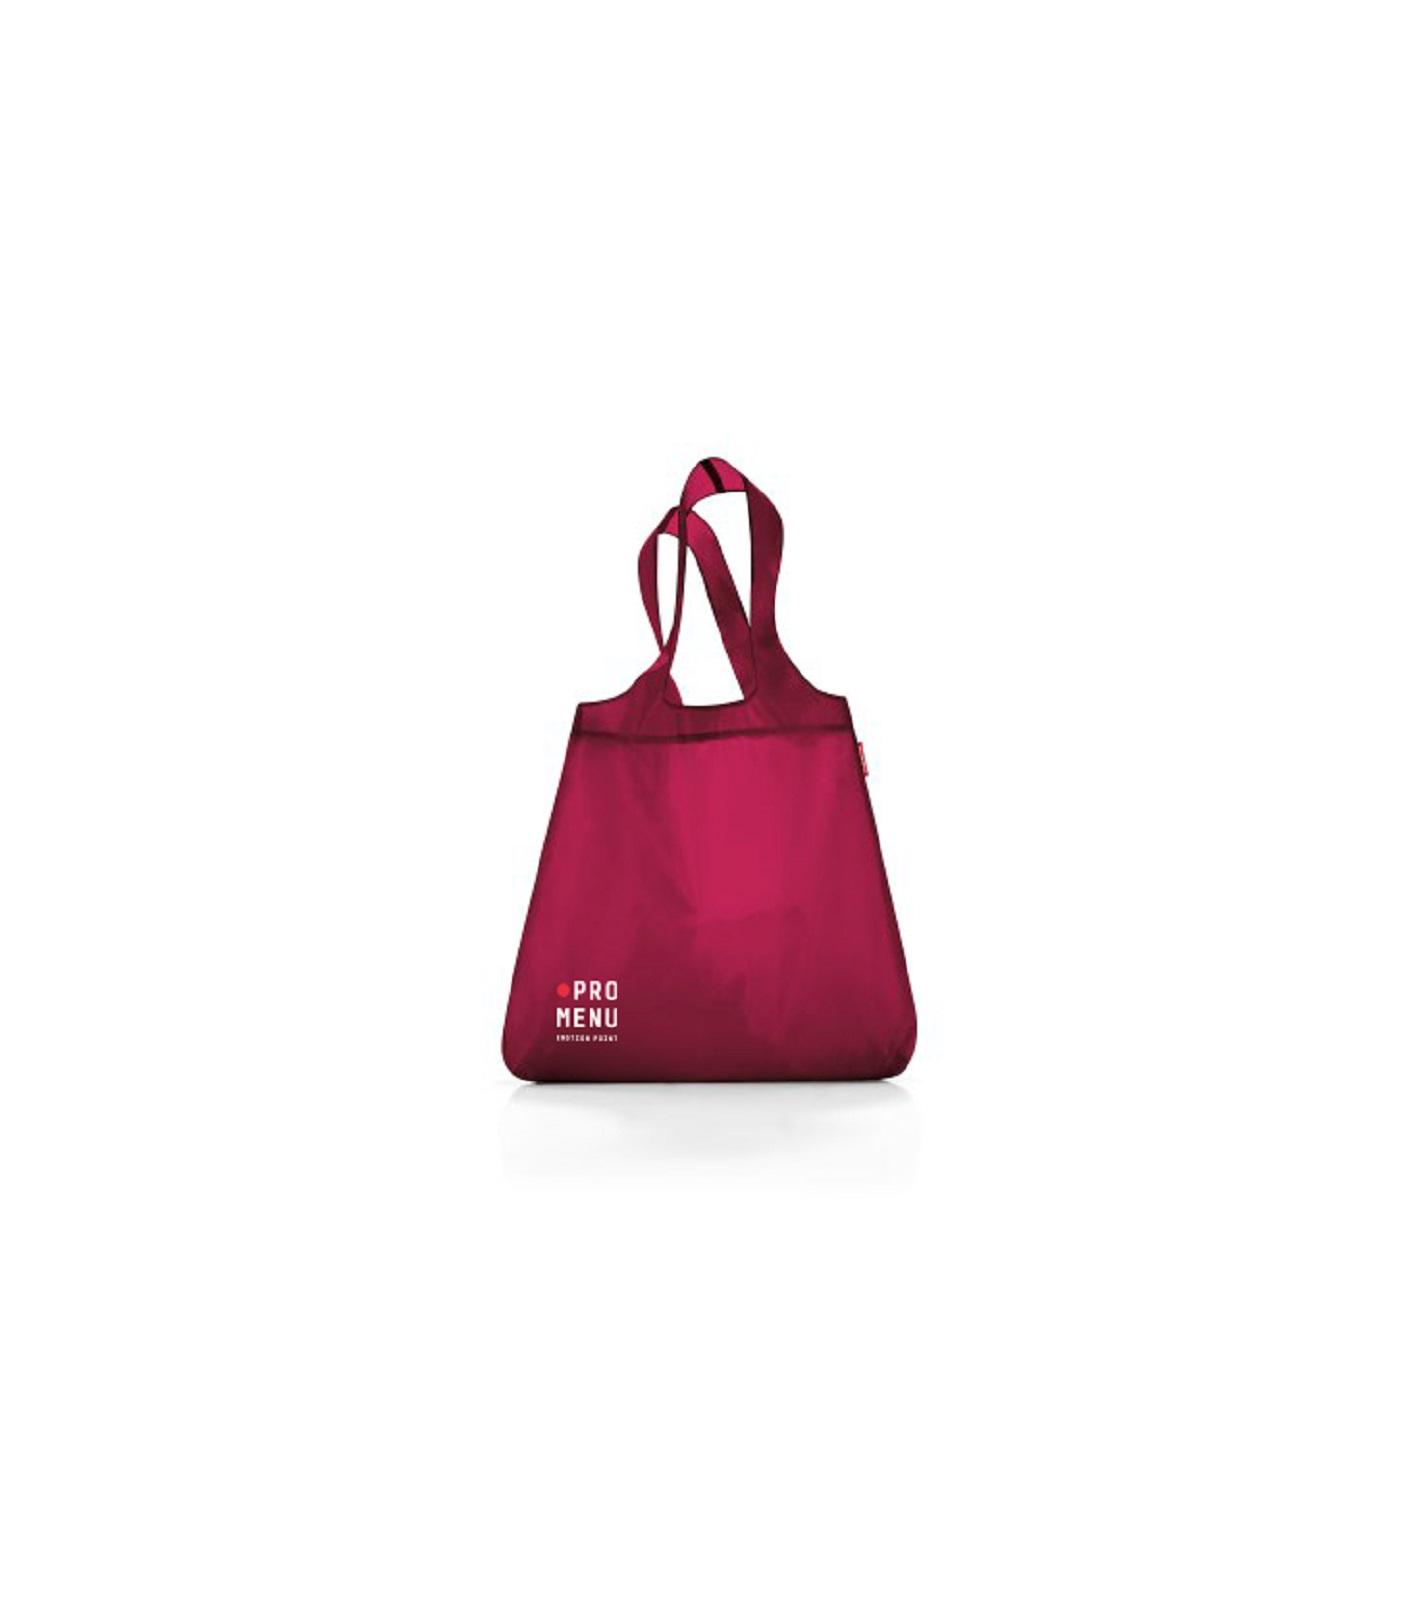 Сумка для шоппинга с лого Promenu Reisenthel Mini maxi shopper collection, 43,5 х 63 х 6 cм, цвет в ассортименте Reisenthel AT 0002LOGO фото 3